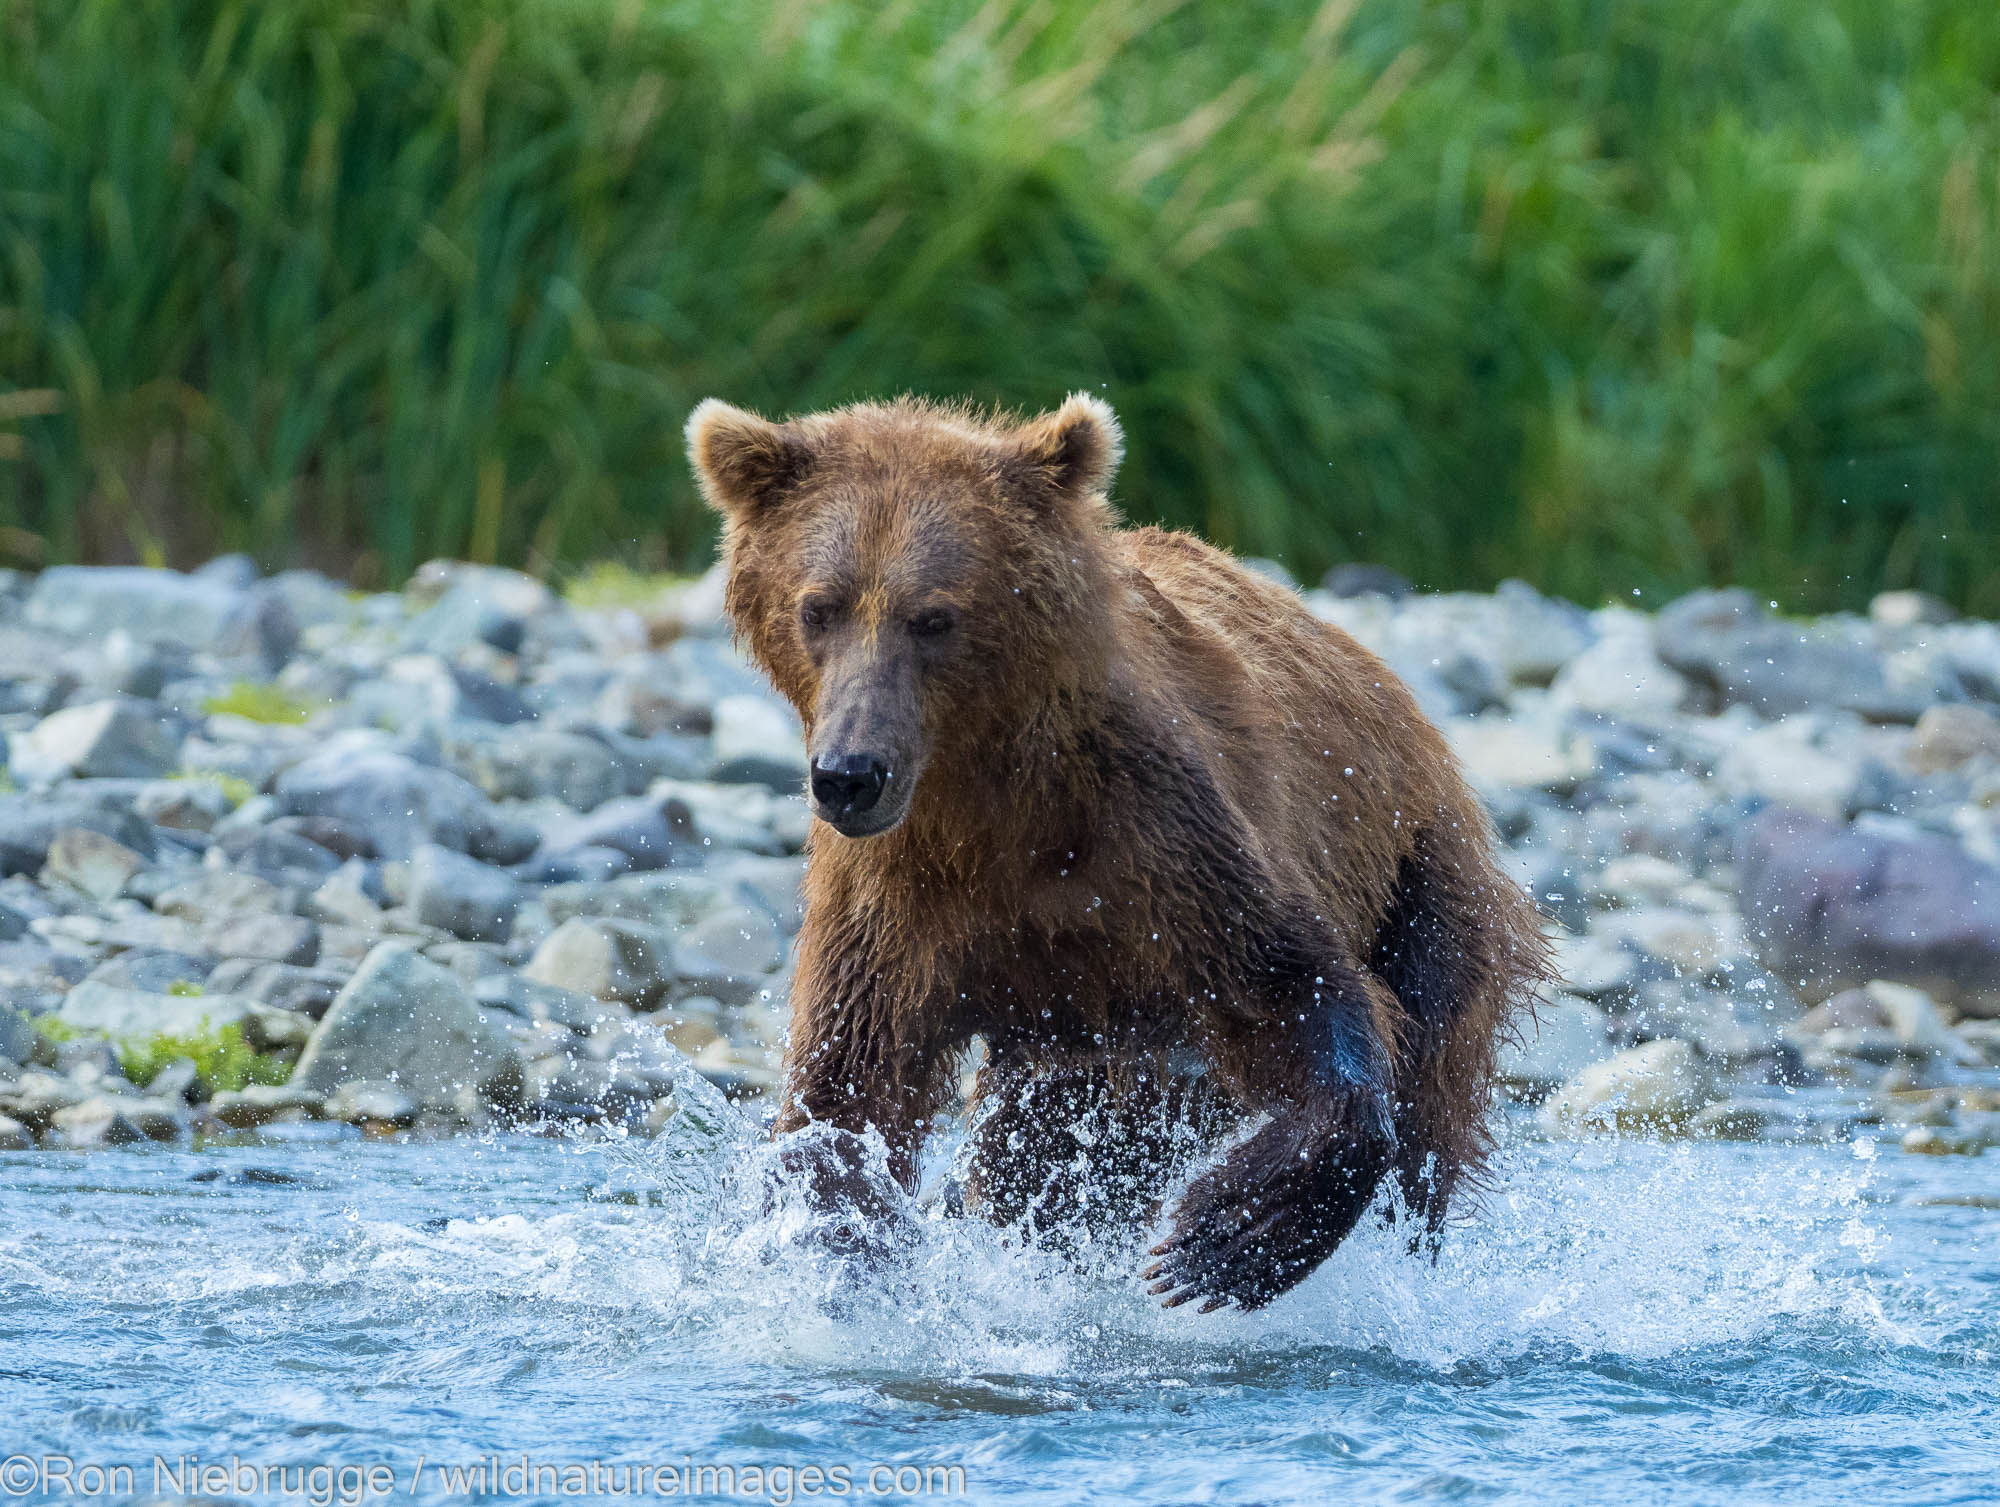 A Brown or Grizzly Bear, Geographic Harbor, Katmai National Park, Alaska.